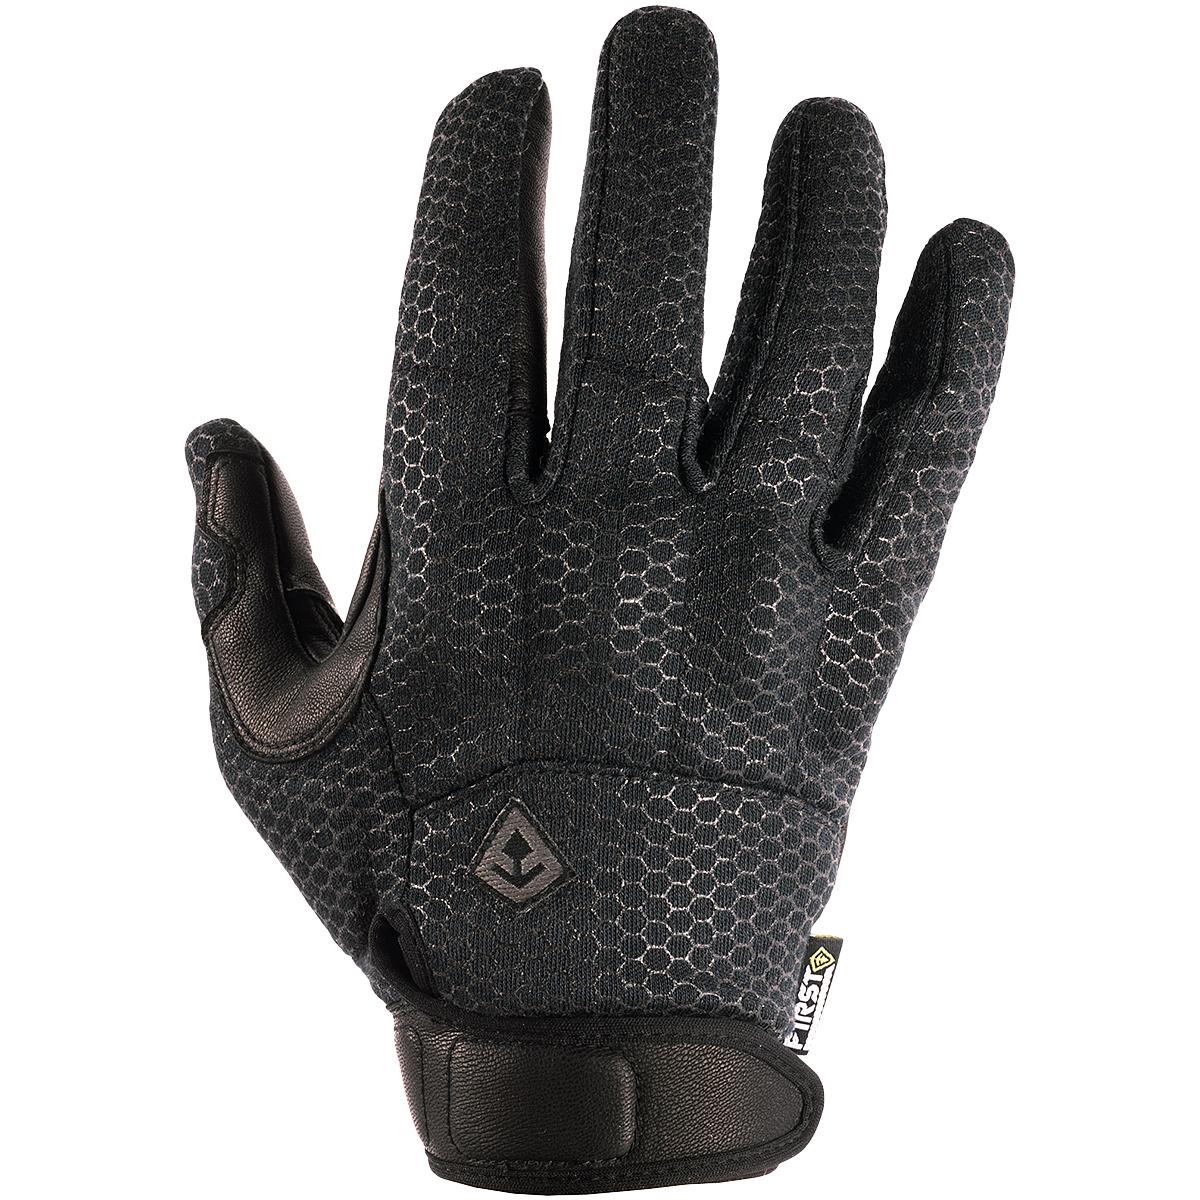 how to break in tactical gloves